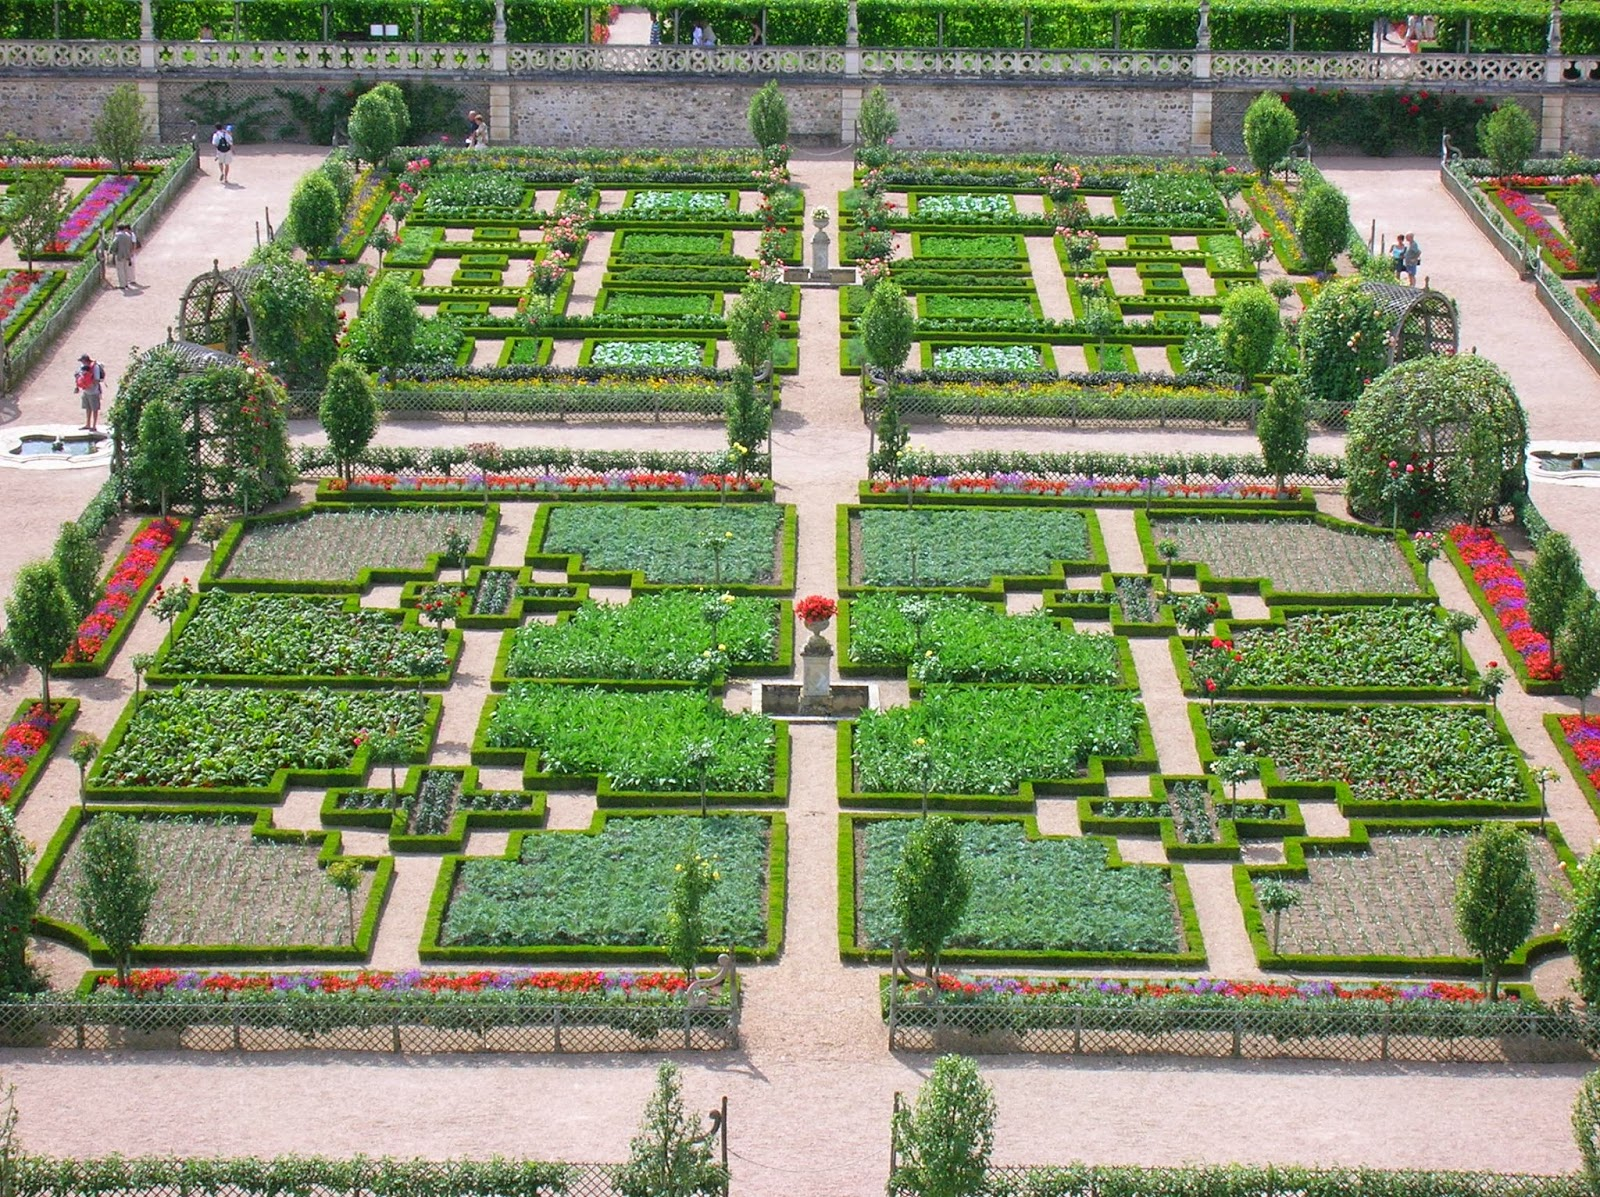 Centro ricerca piante officinali veneto giardini storici Le jardin francais